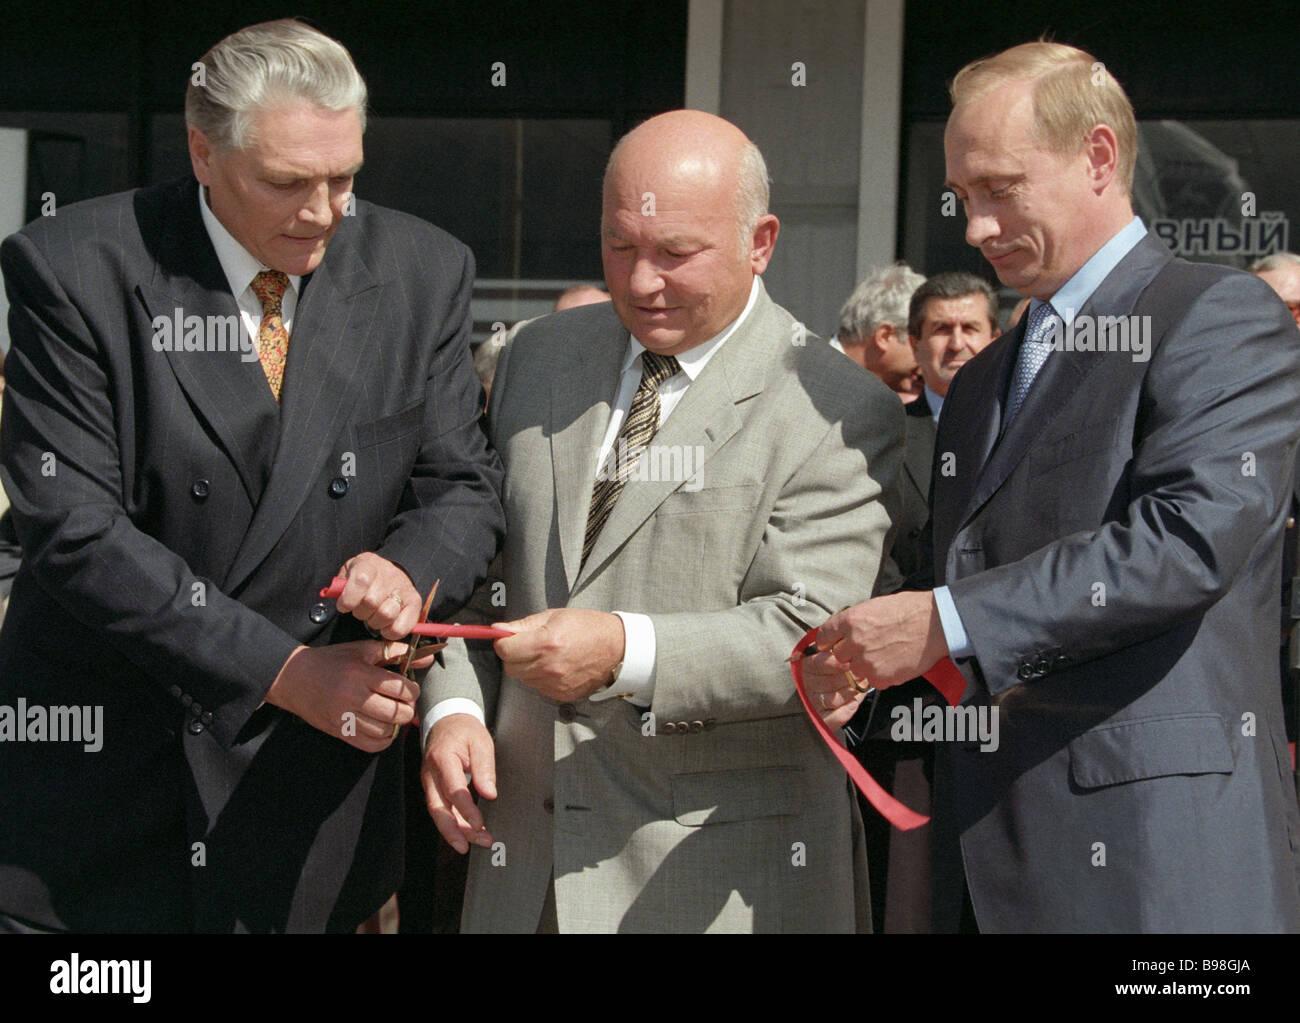 Left to right OAO GAZ President Nikolai Pugin Moscow Mayor Yury Luzhkov and Russian Prime Minister Vladimir Putin - Stock Image